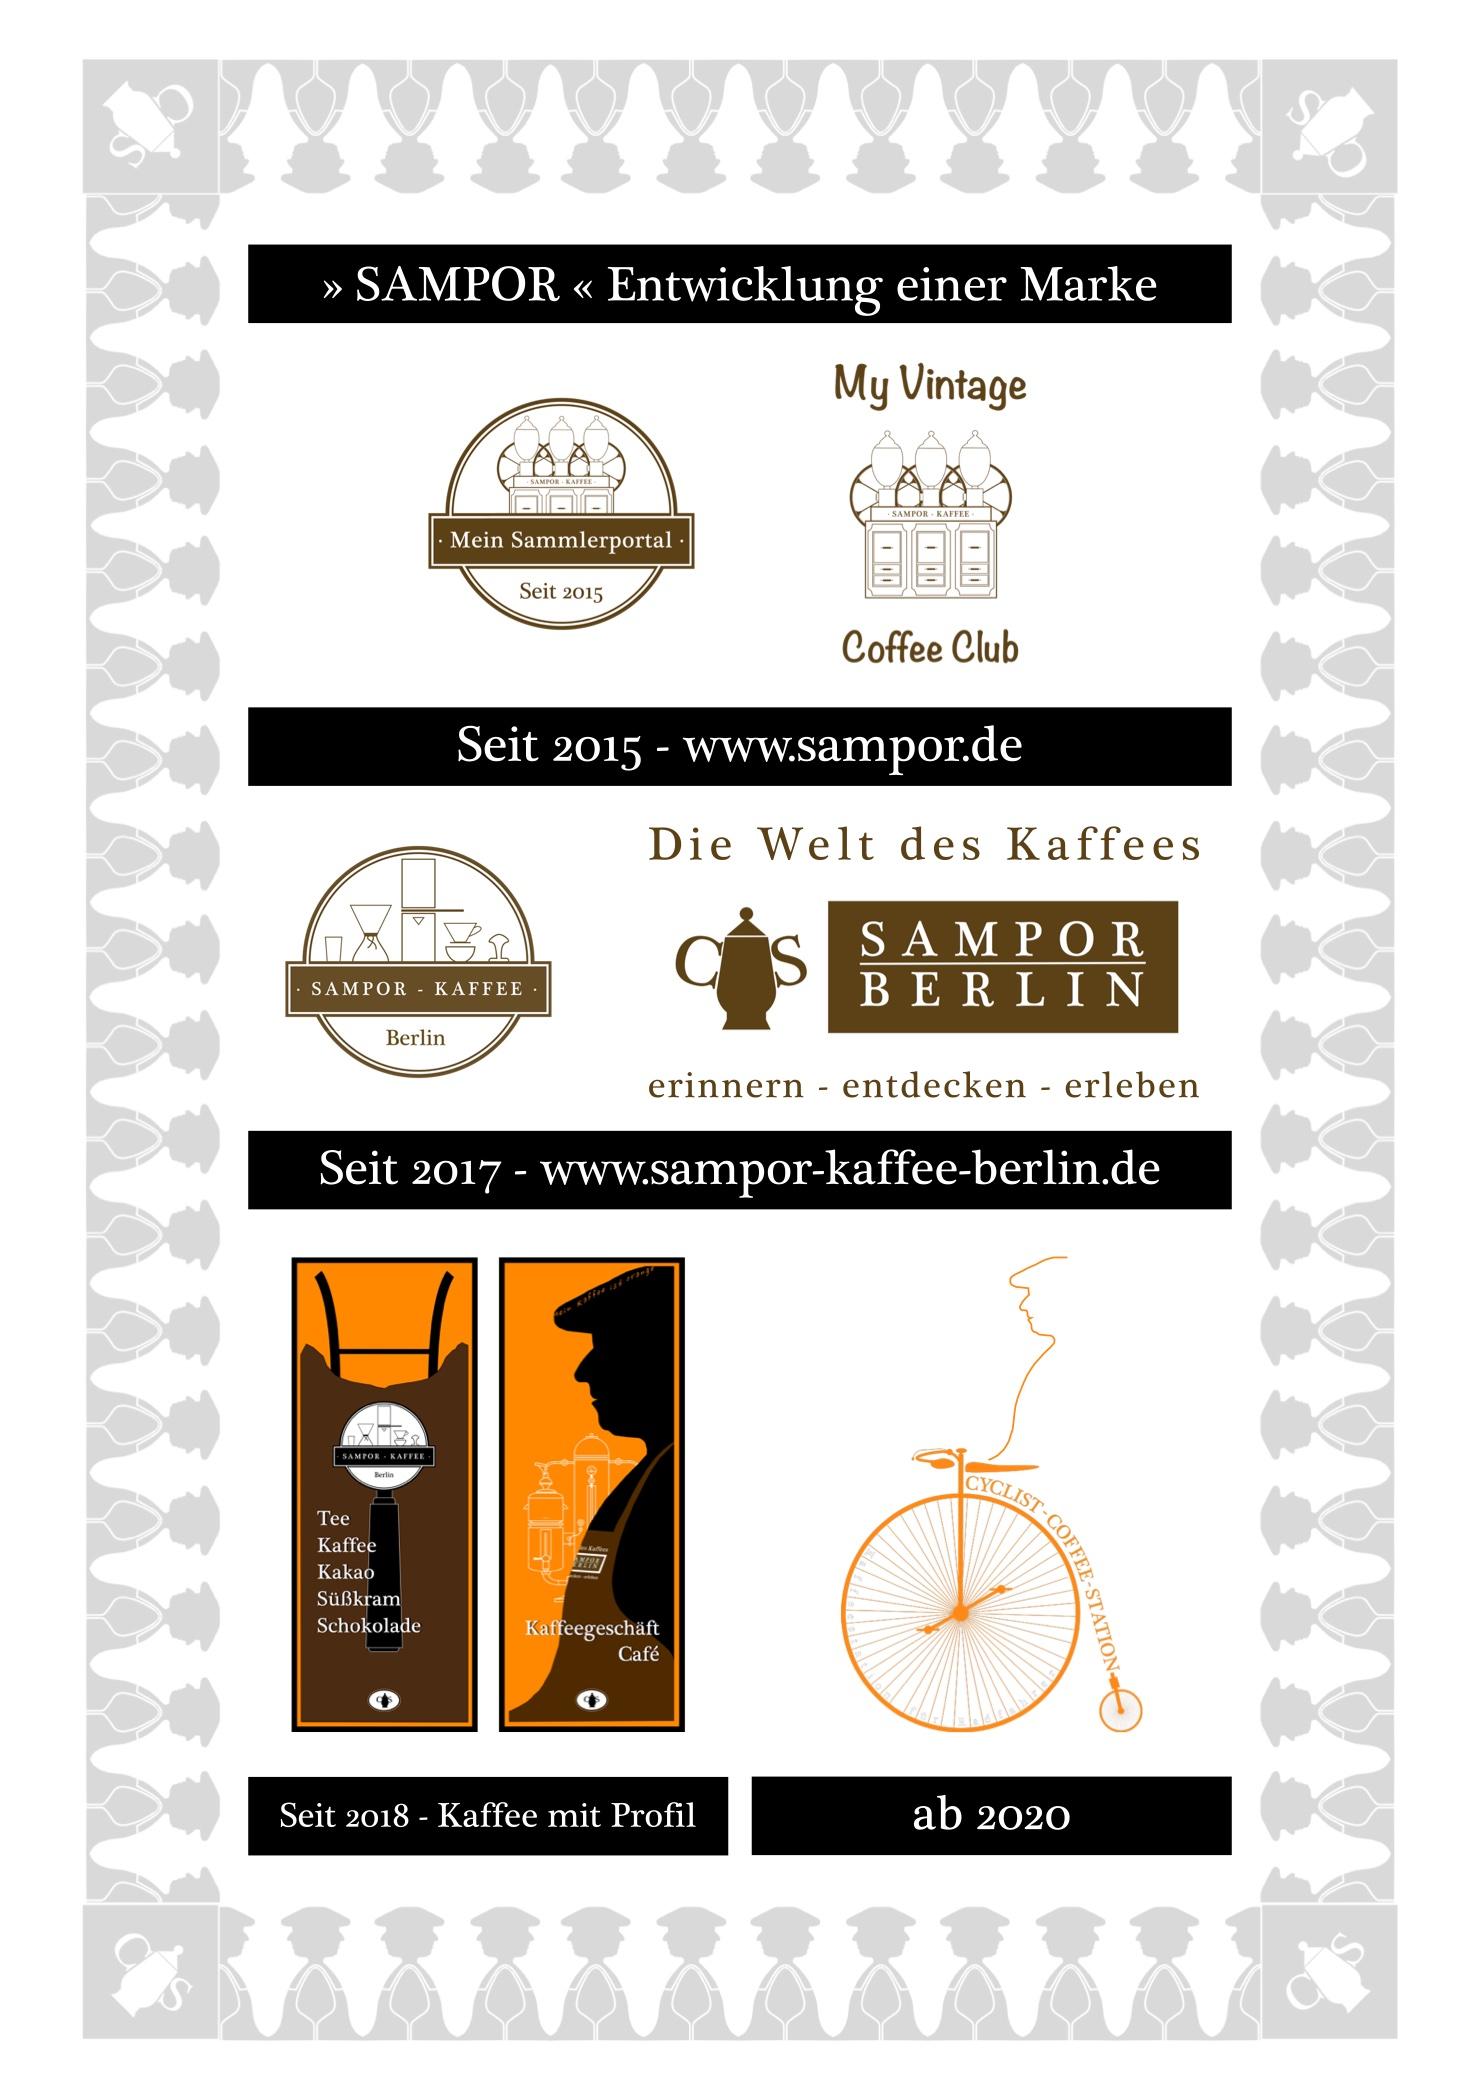 Marke, Branding, SAMPOR, Berlin, Kaffee, Tegel, Kaffee mit Profil